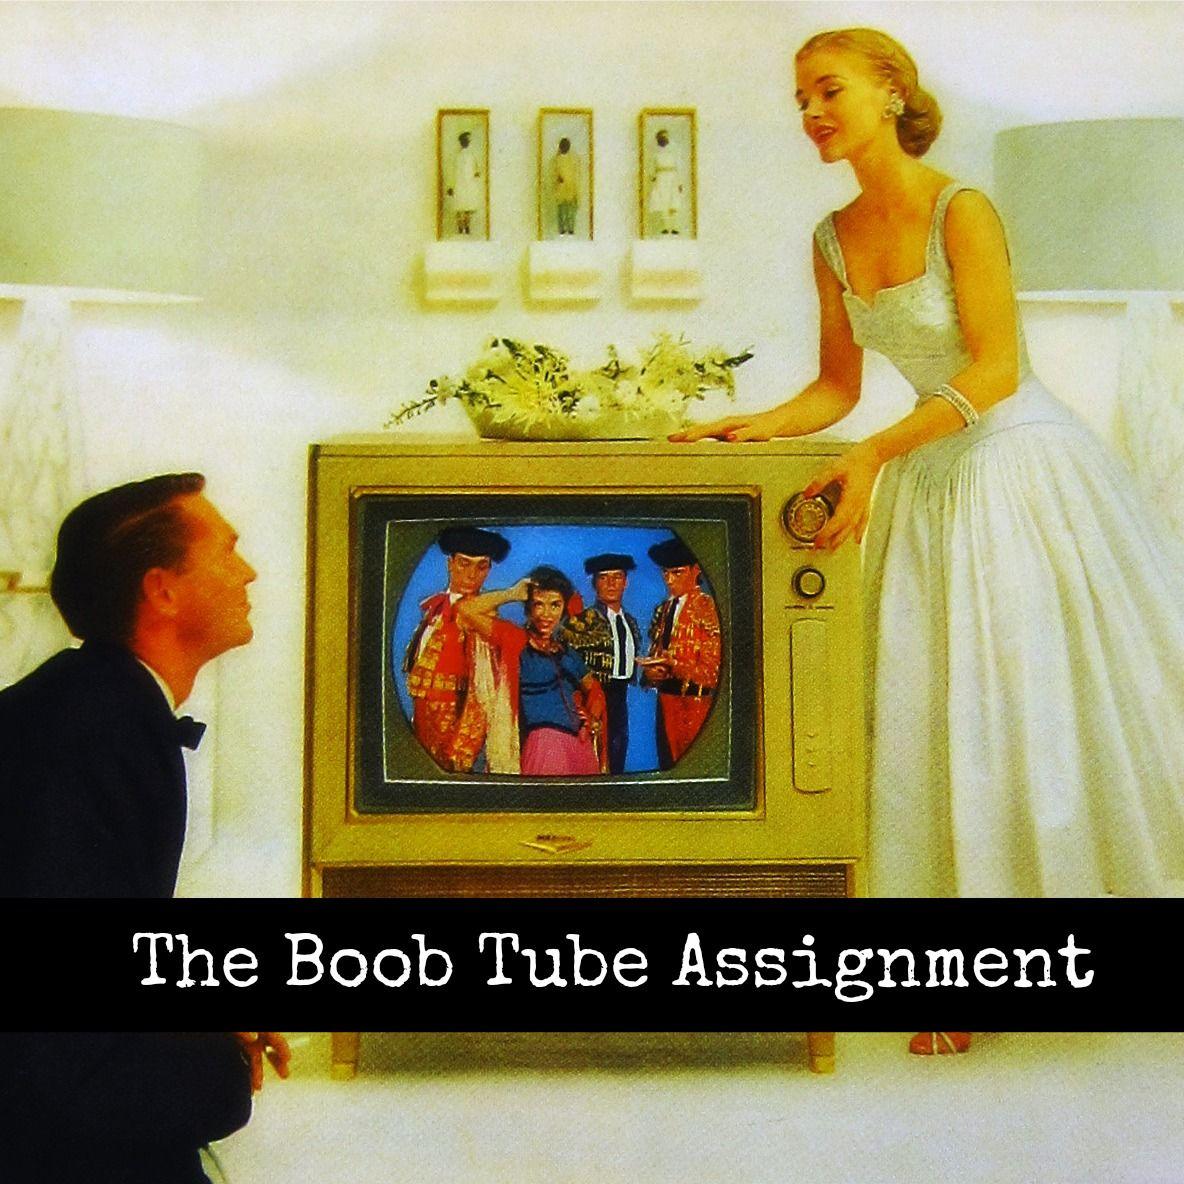 Boob tube food group